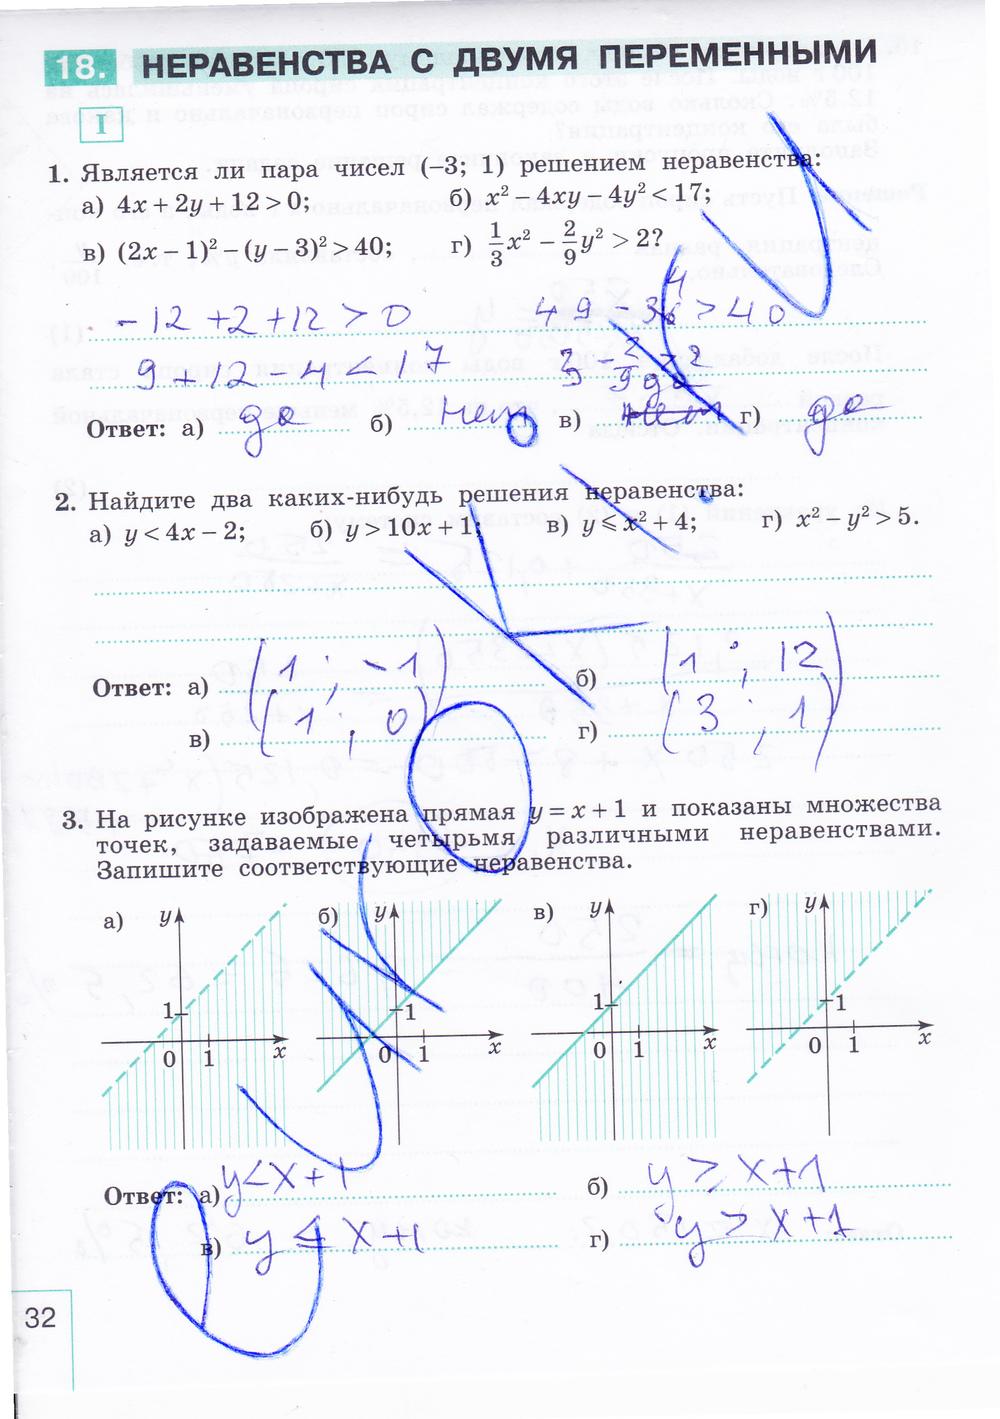 гдз по рабочим тетрадям по алгебре 9 класс